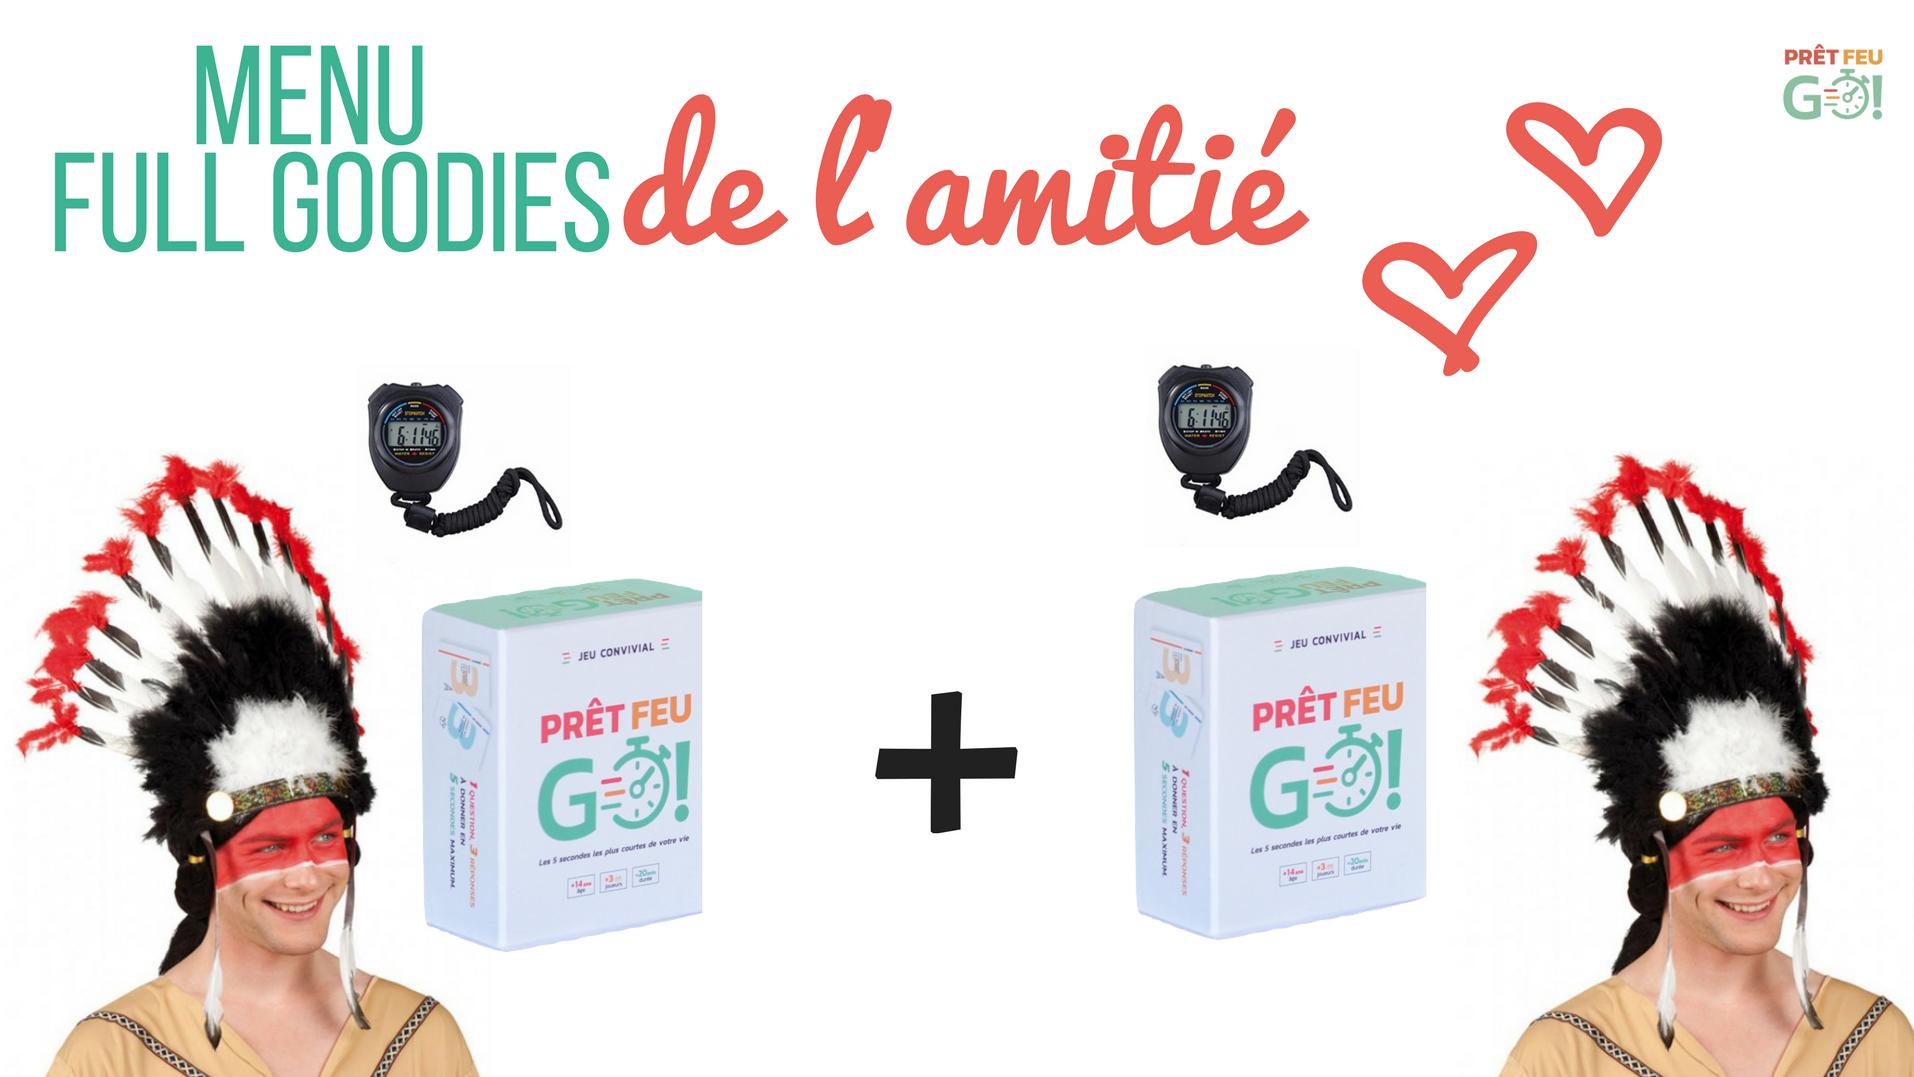 full_goodies_de_l_amitie___1_-1522254649.png